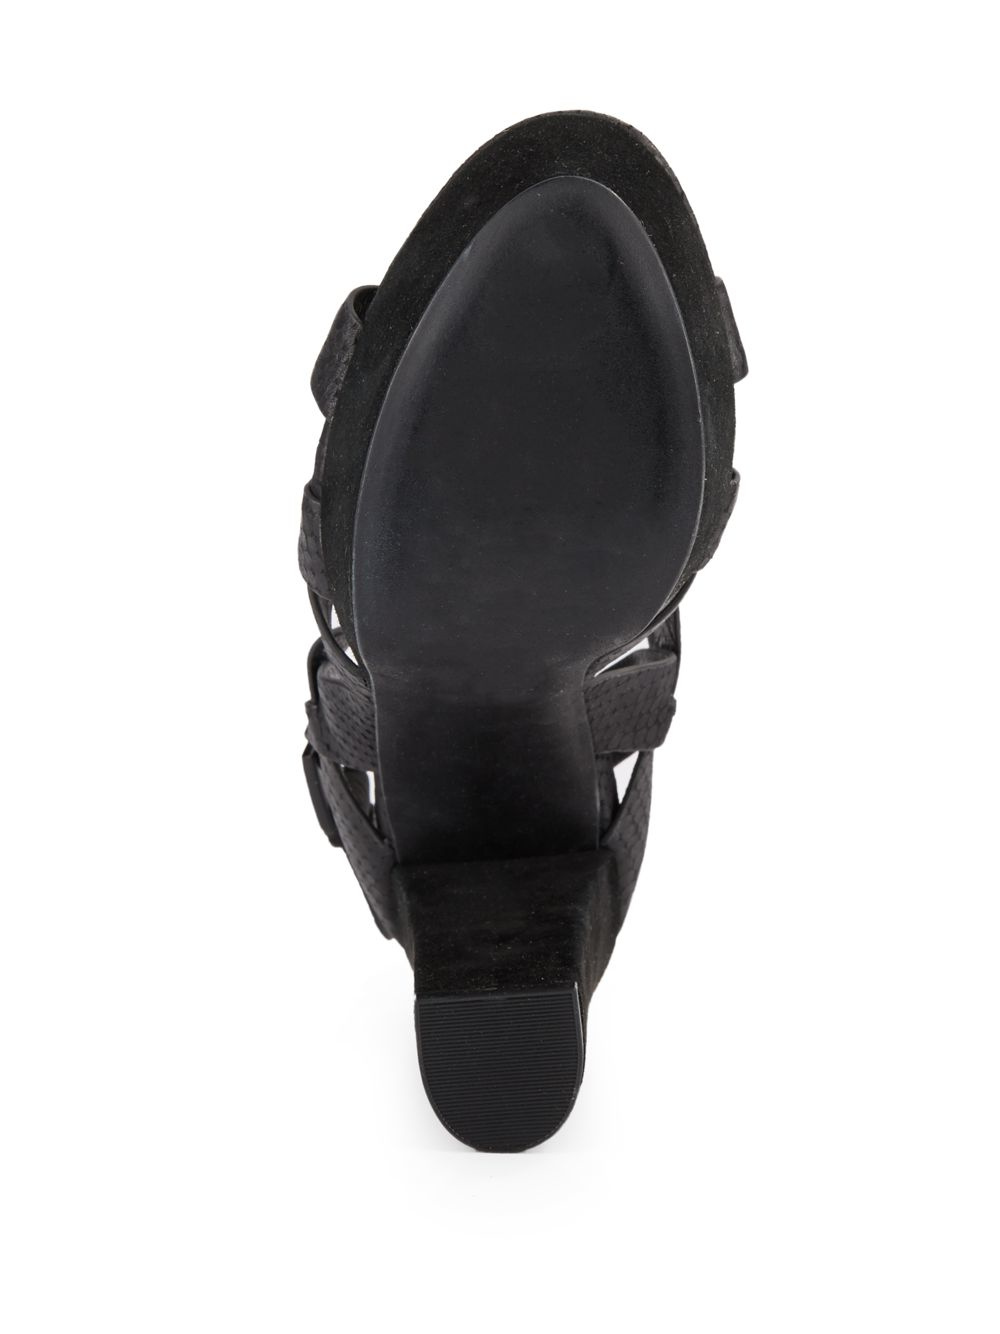 1a4f812e52d Lyst - Joie Inez Snakeskin-embossed Leather Platform Sandals in Black